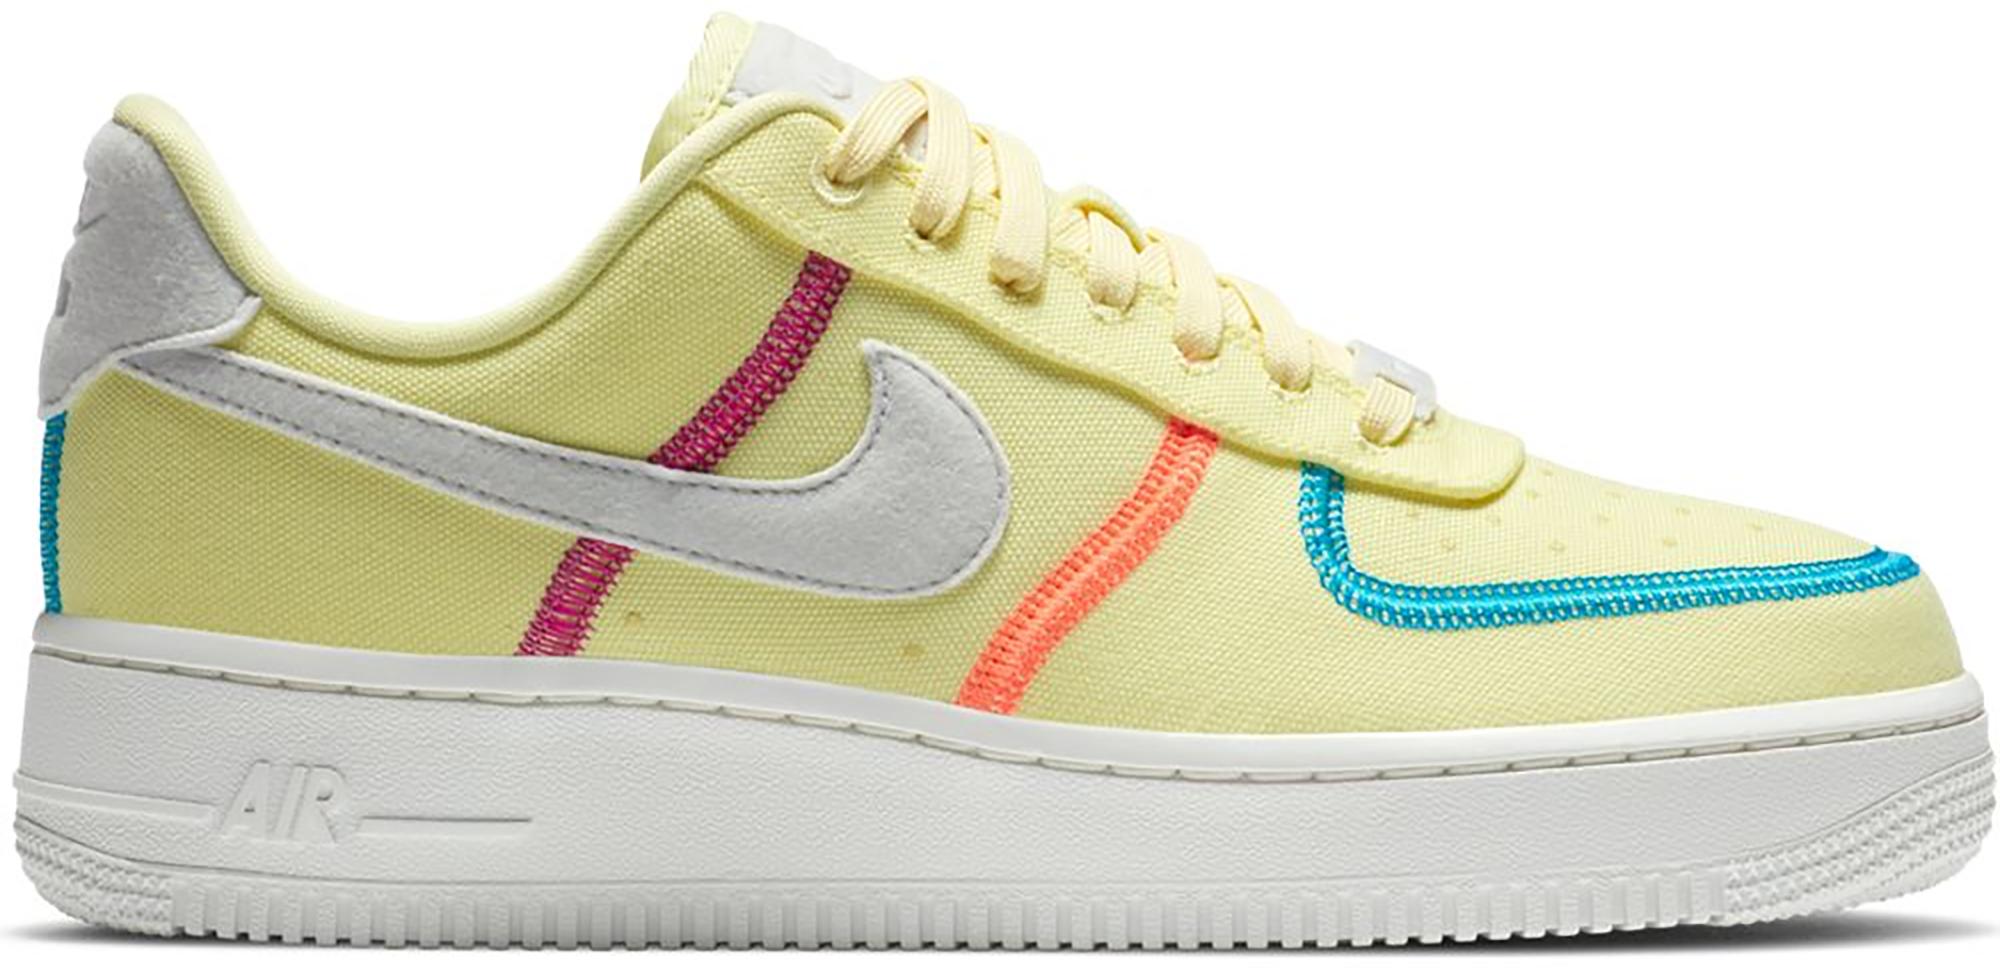 Nike Air Force 1 LX Life Lime (W